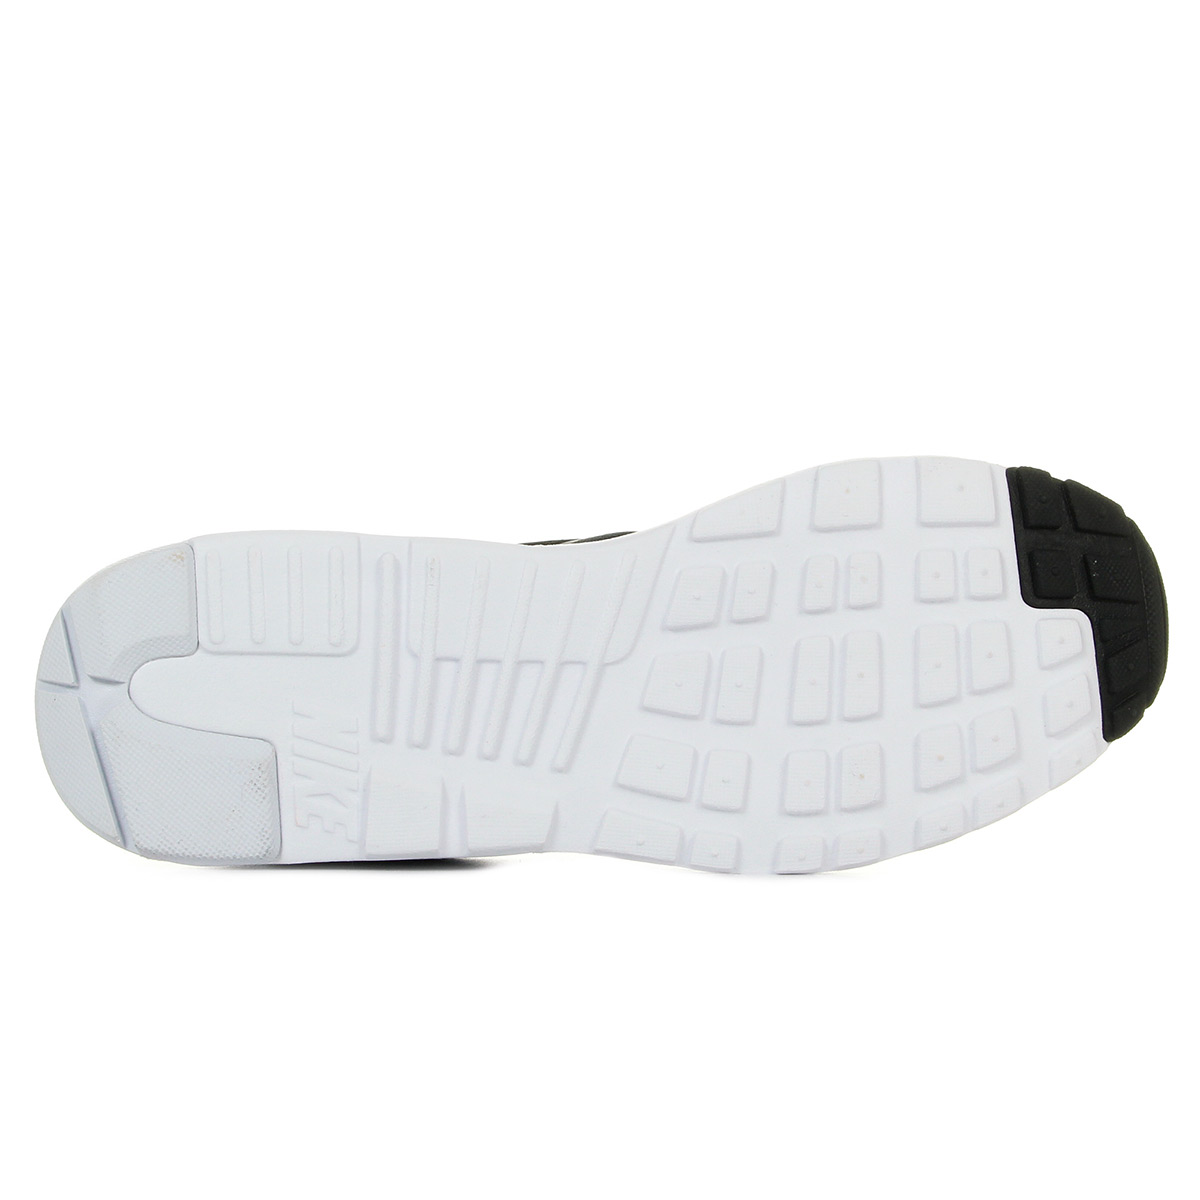 Nike Air Max Vision 918230007, Baskets mode homme